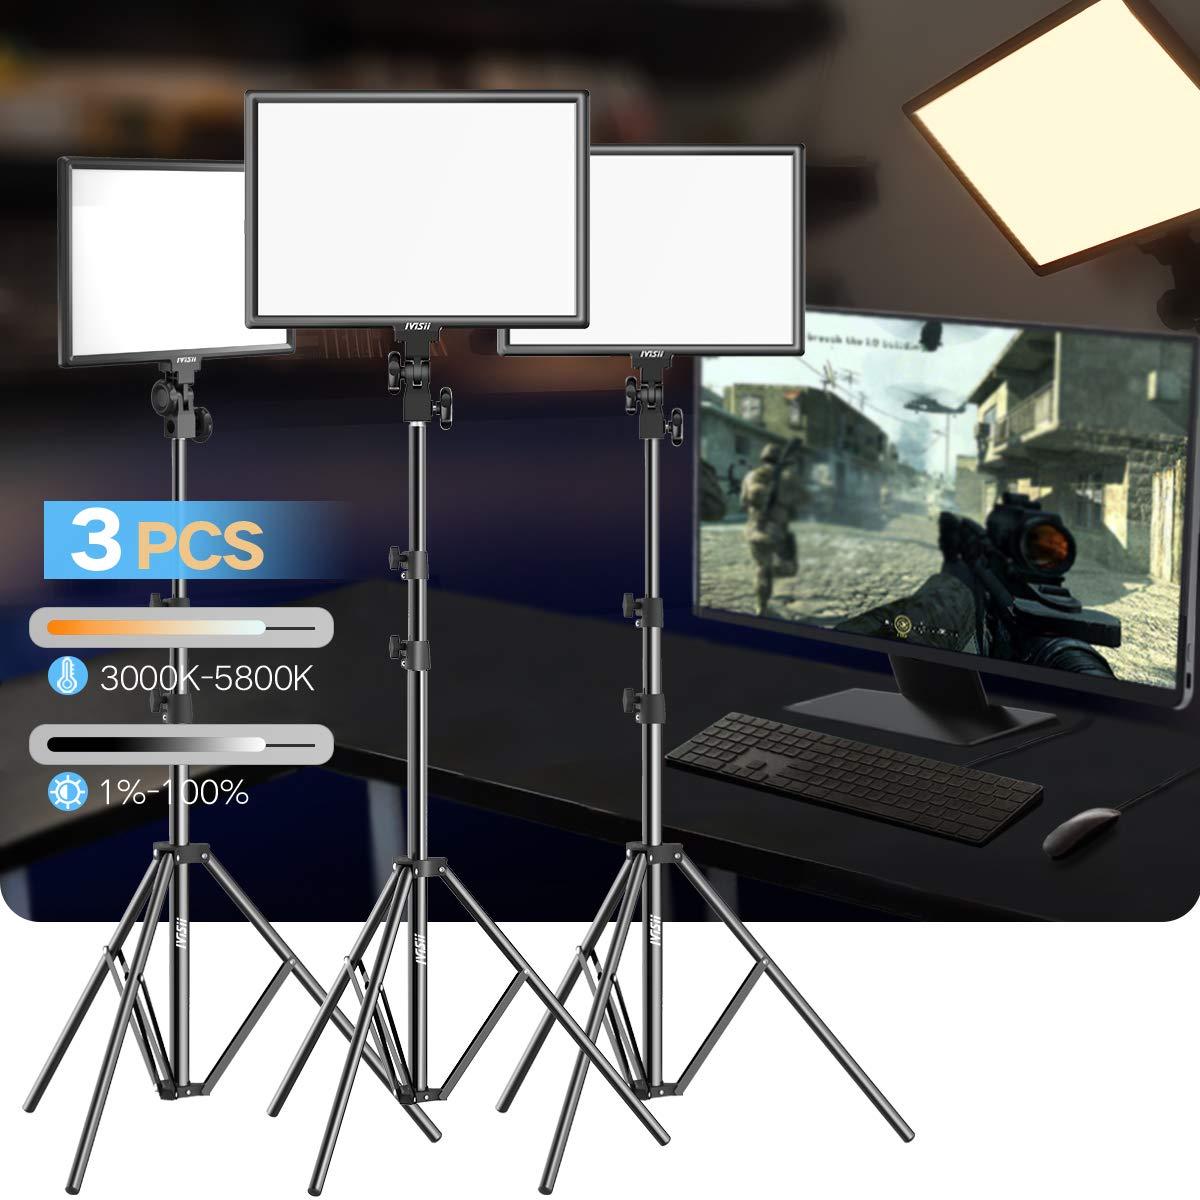 LED Video Light Kit - 15.4 Inch Bi-Color 3000k-5800k 45W Dimmable LED Panel Adjustable Light Stand Canon Nikon Pentax Camera Camcorder Studio Shooting (3-Pack)